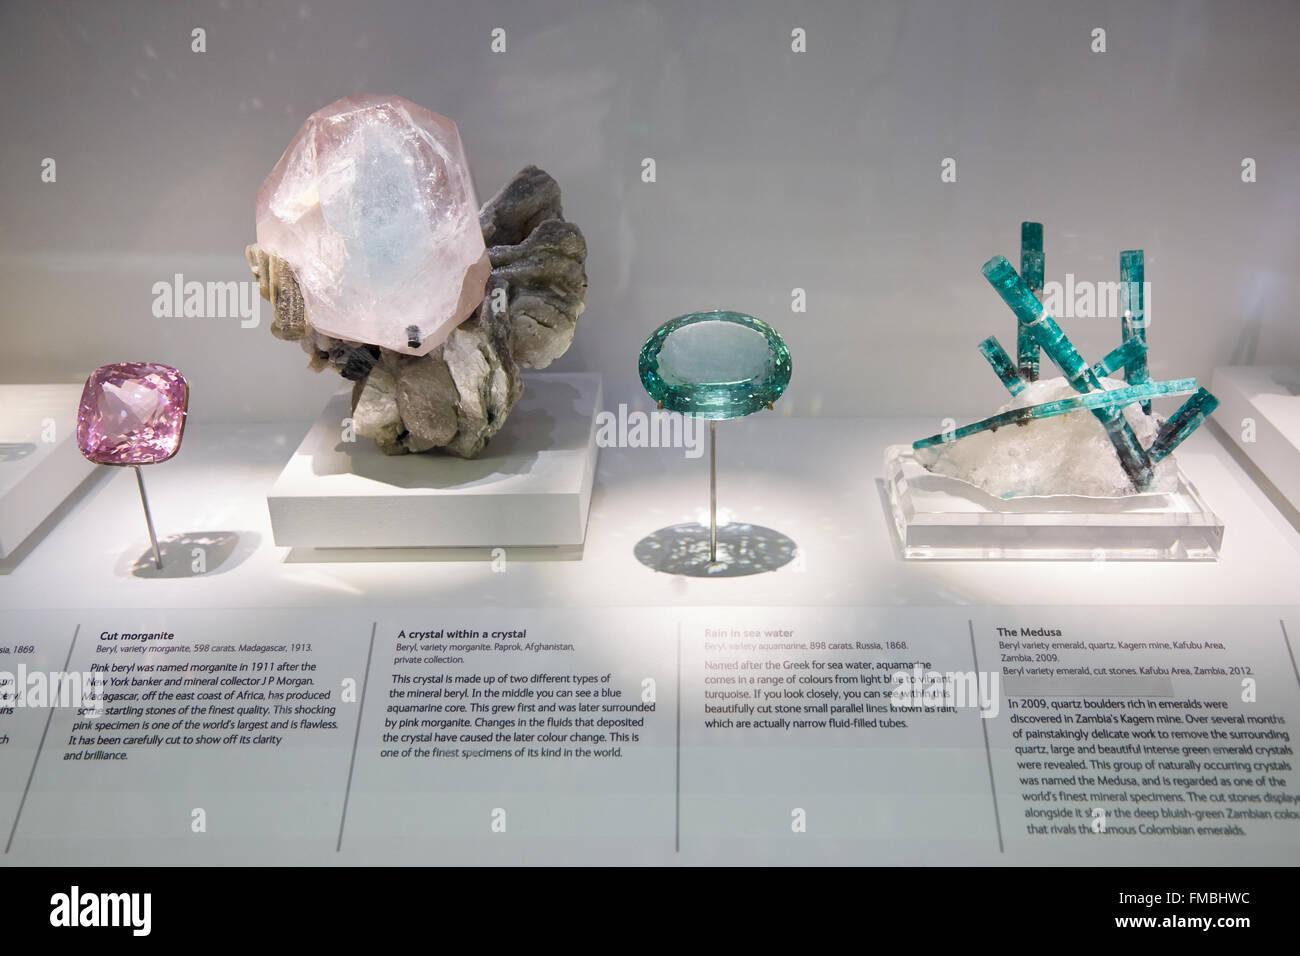 Gem Vault Natural History Museum